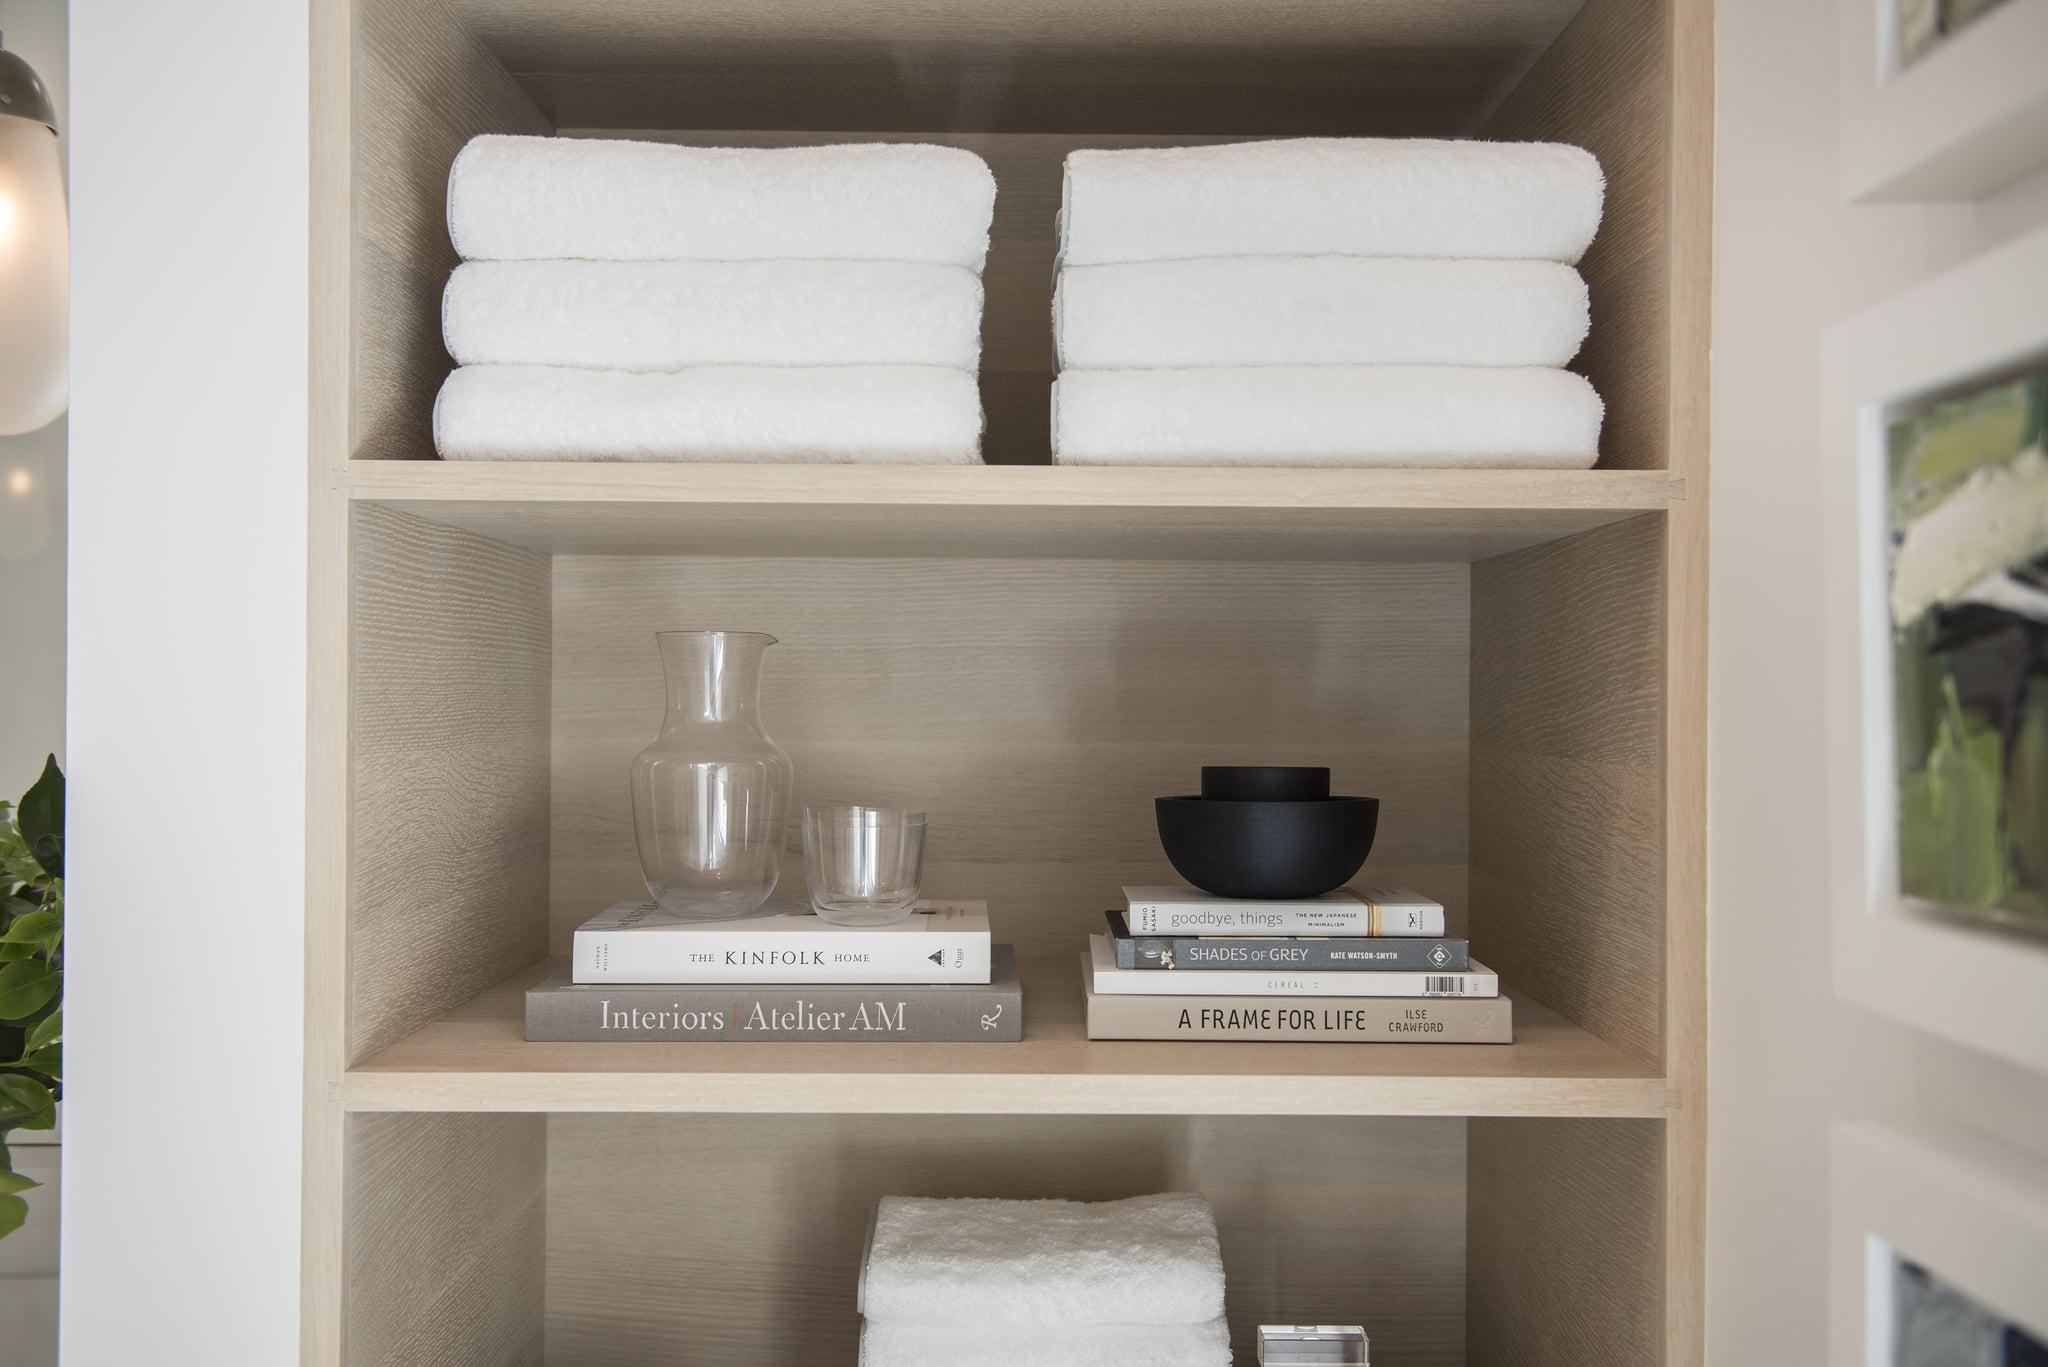 what to use to make towels smell better popsugar home australia. Black Bedroom Furniture Sets. Home Design Ideas